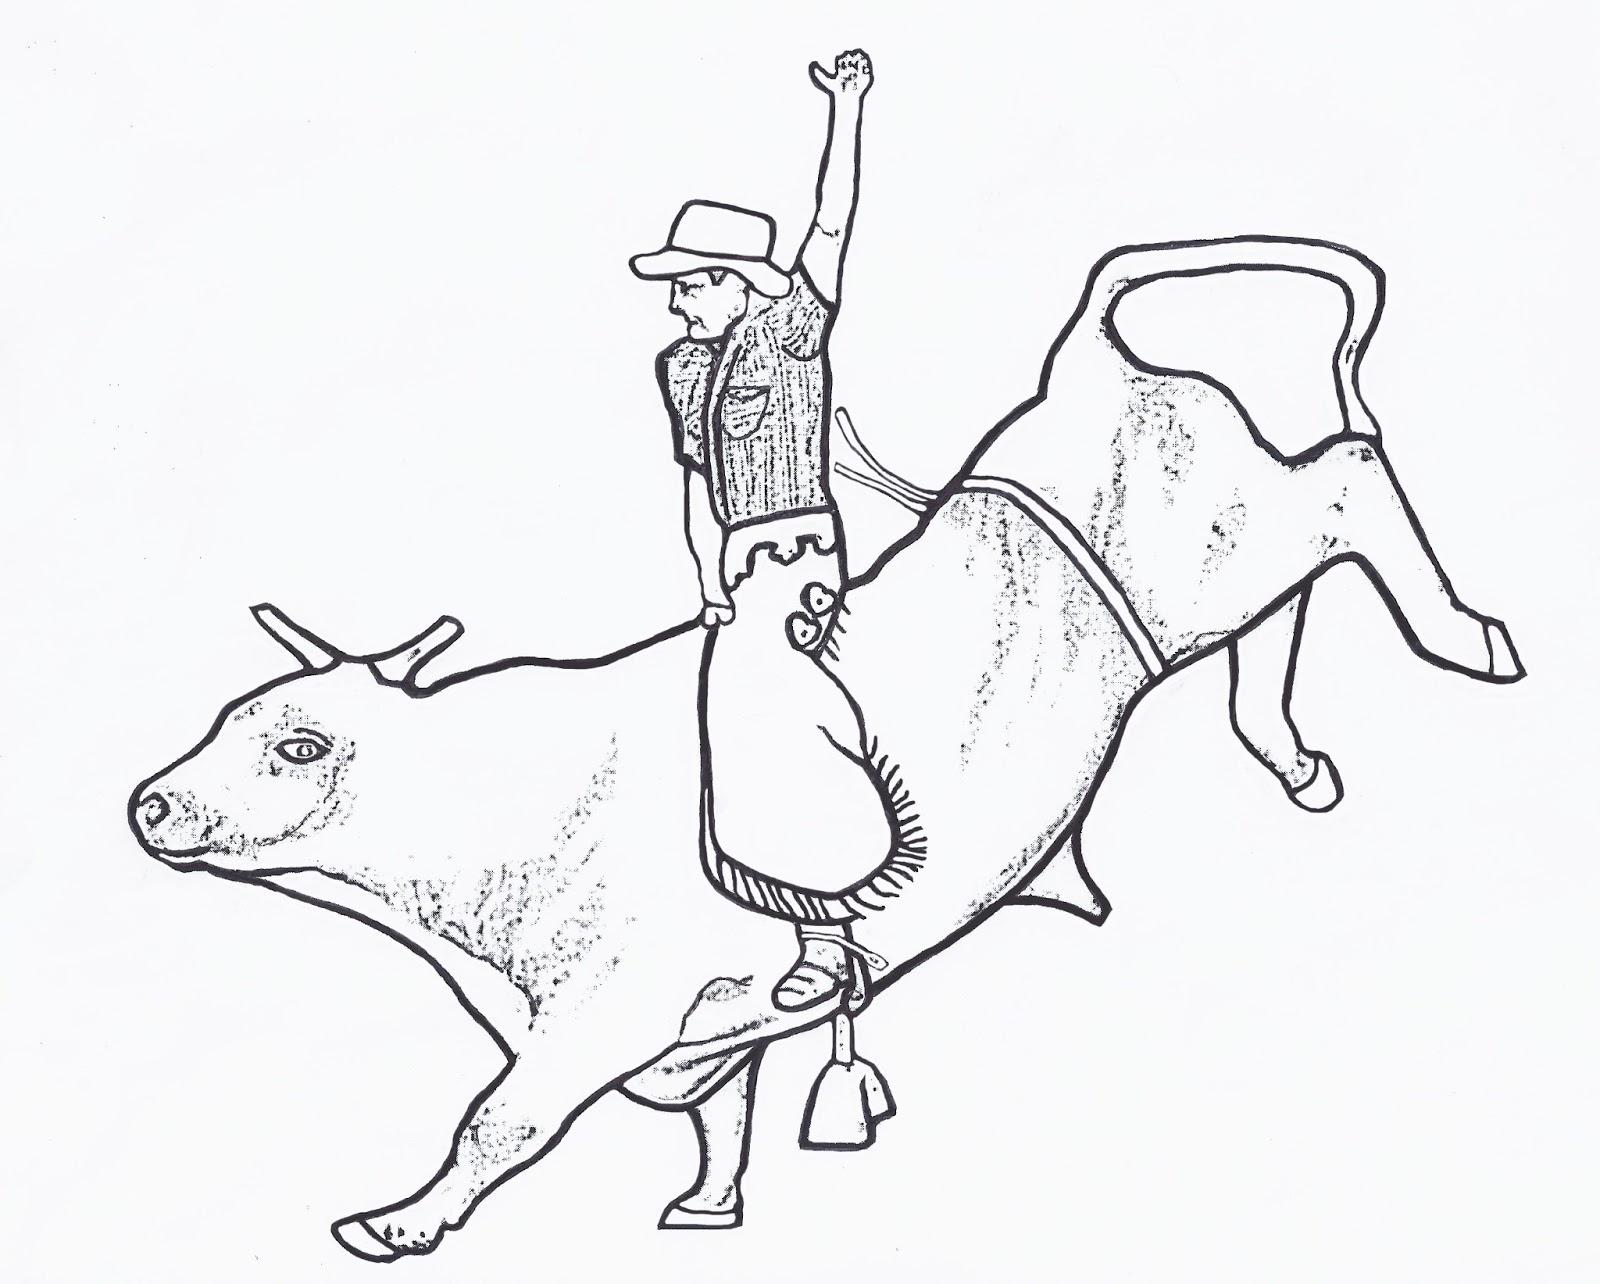 1600x1284 Bull Riding Coloring Pages 02 Mason Bull Riding